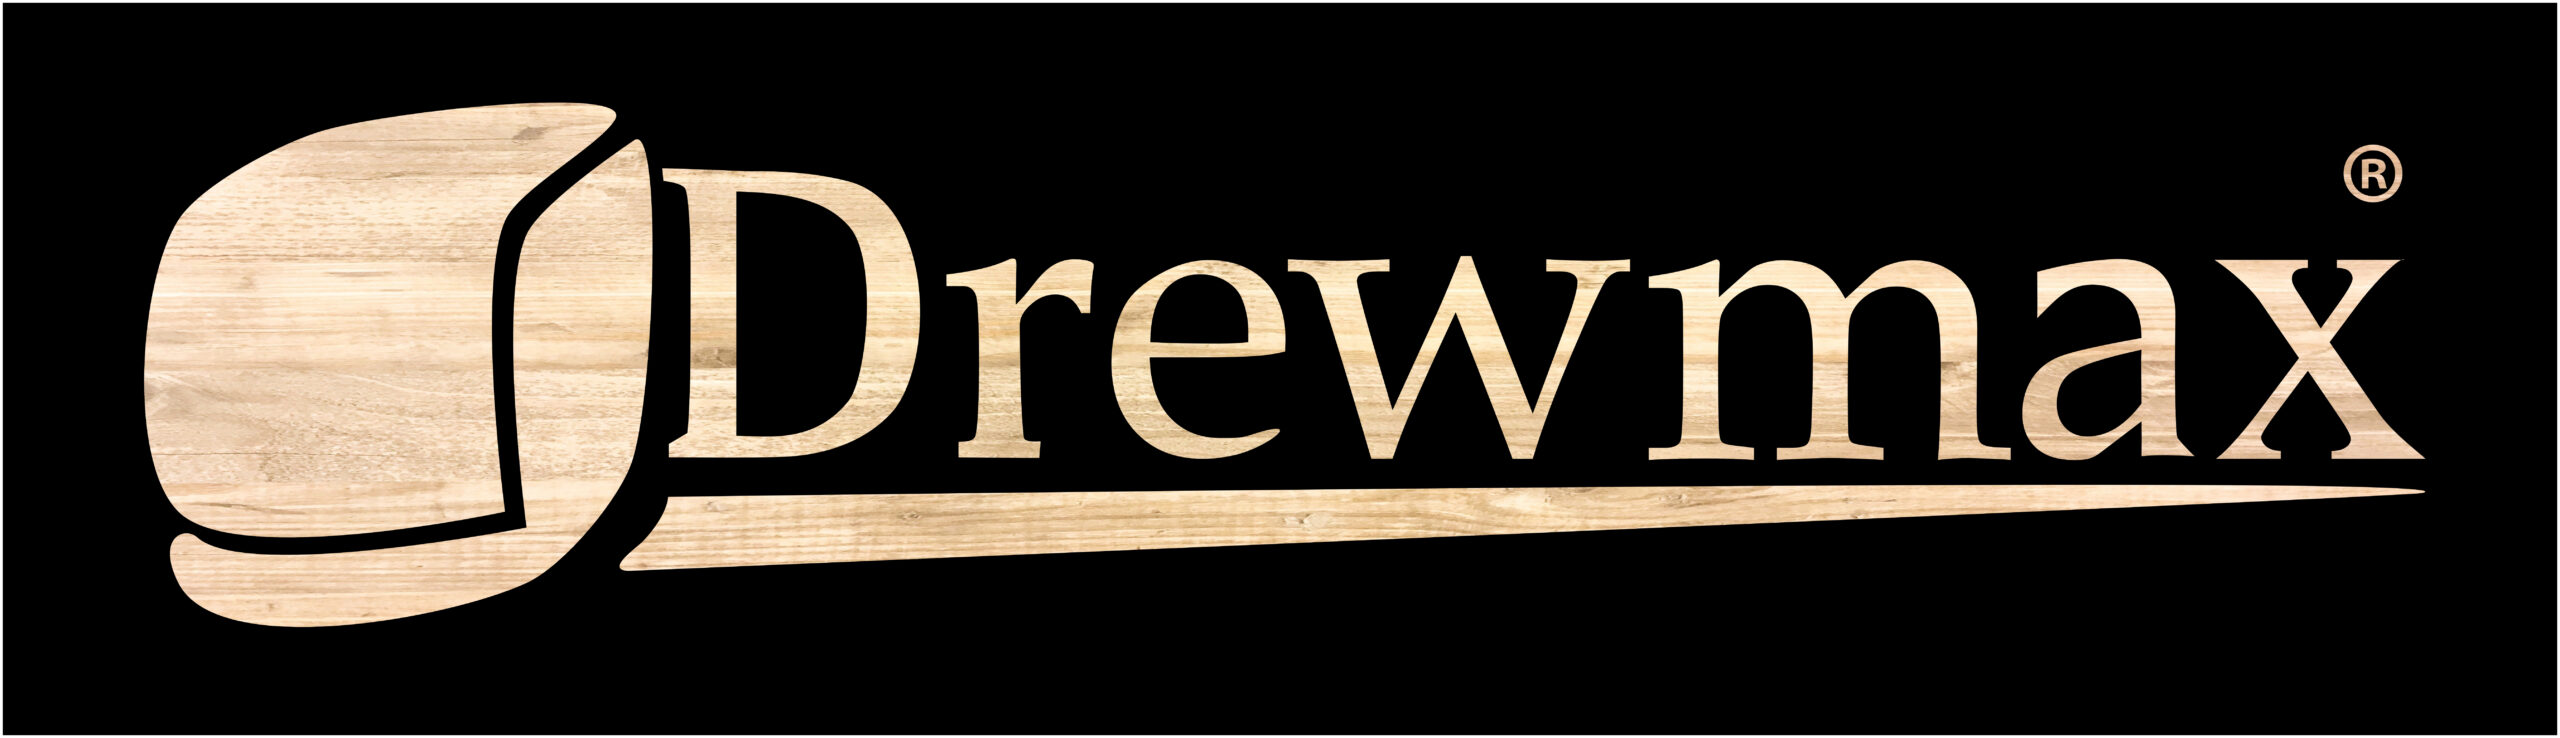 Drewmax_woody_logo_black_bg-scaled.jpg